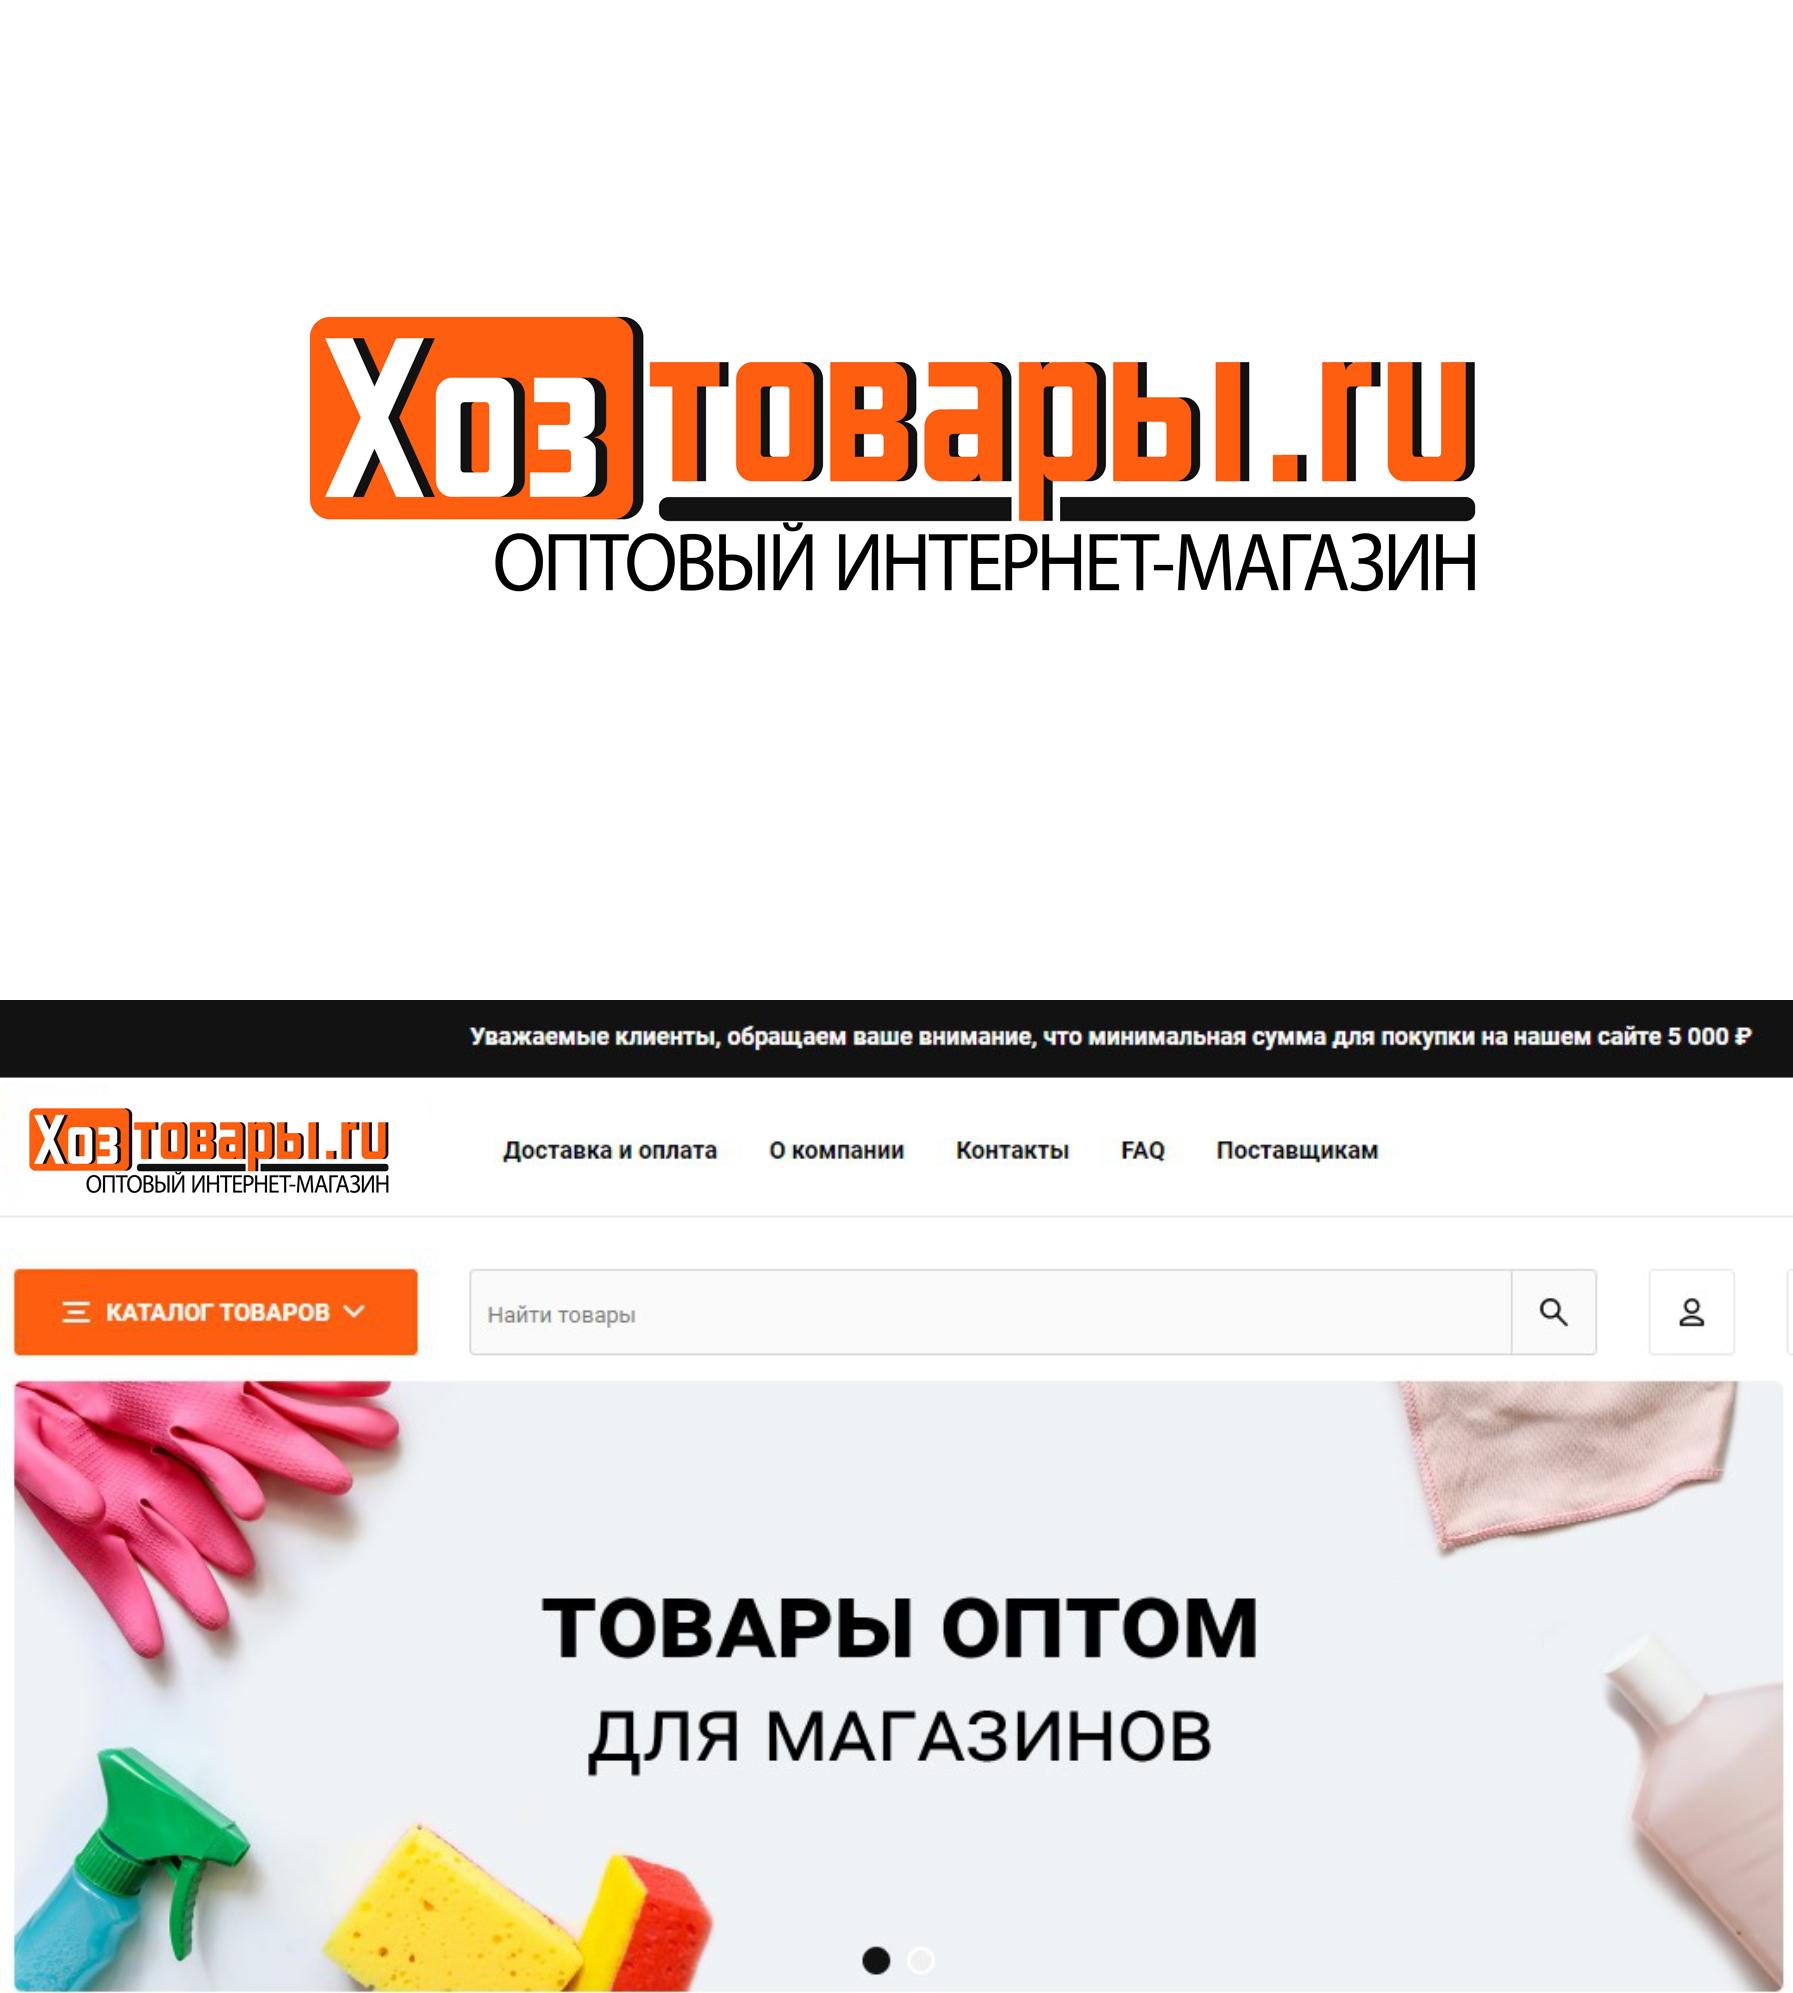 Разработка логотипа для оптового интернет-магазина «Хозтовары.ру» фото f_147606ee9855f7f8.png